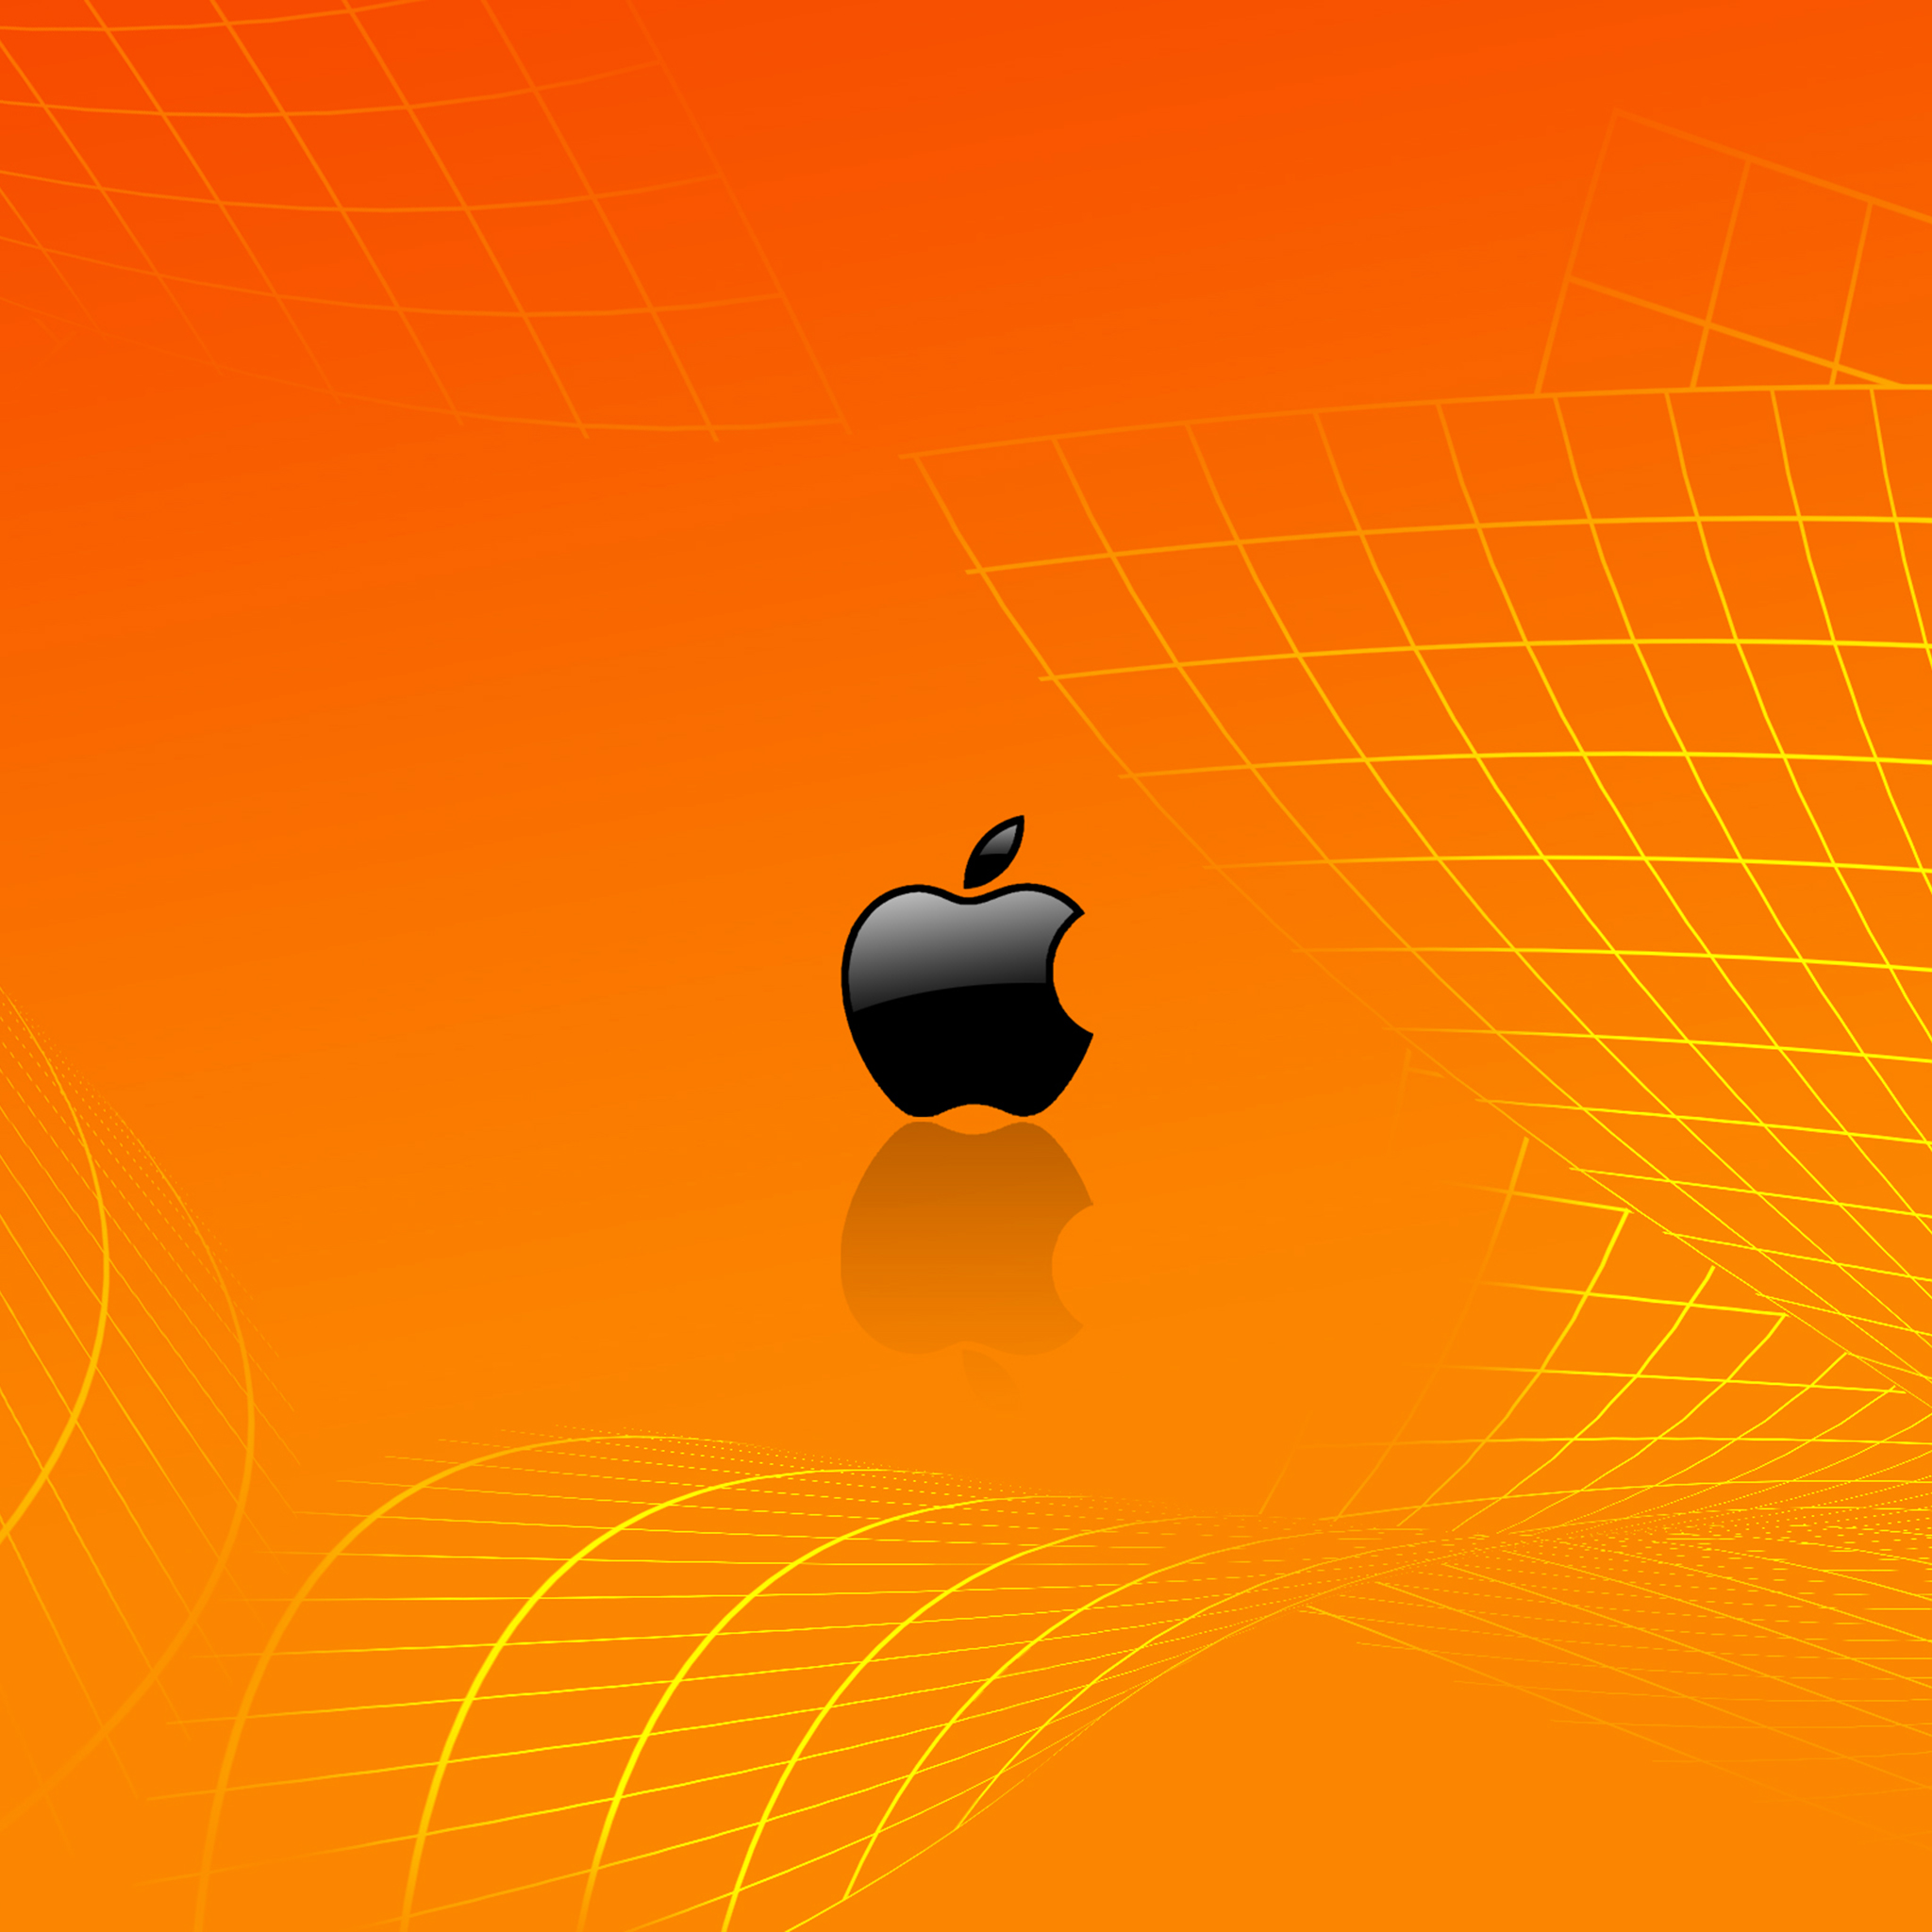 IPad Wallpaper For IPhone X, 8, 7, 6